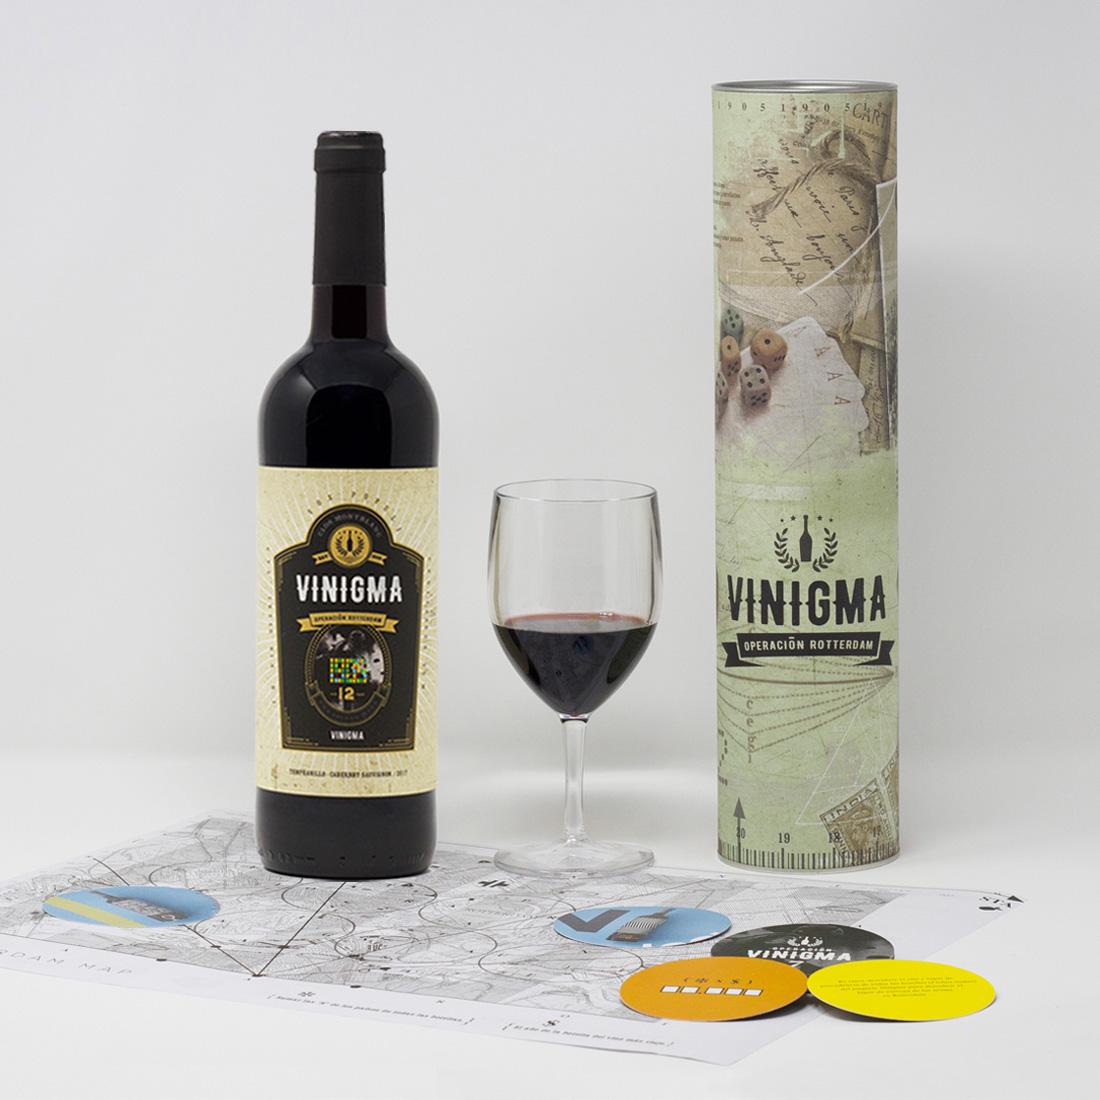 vinigma1cocotienda (1)